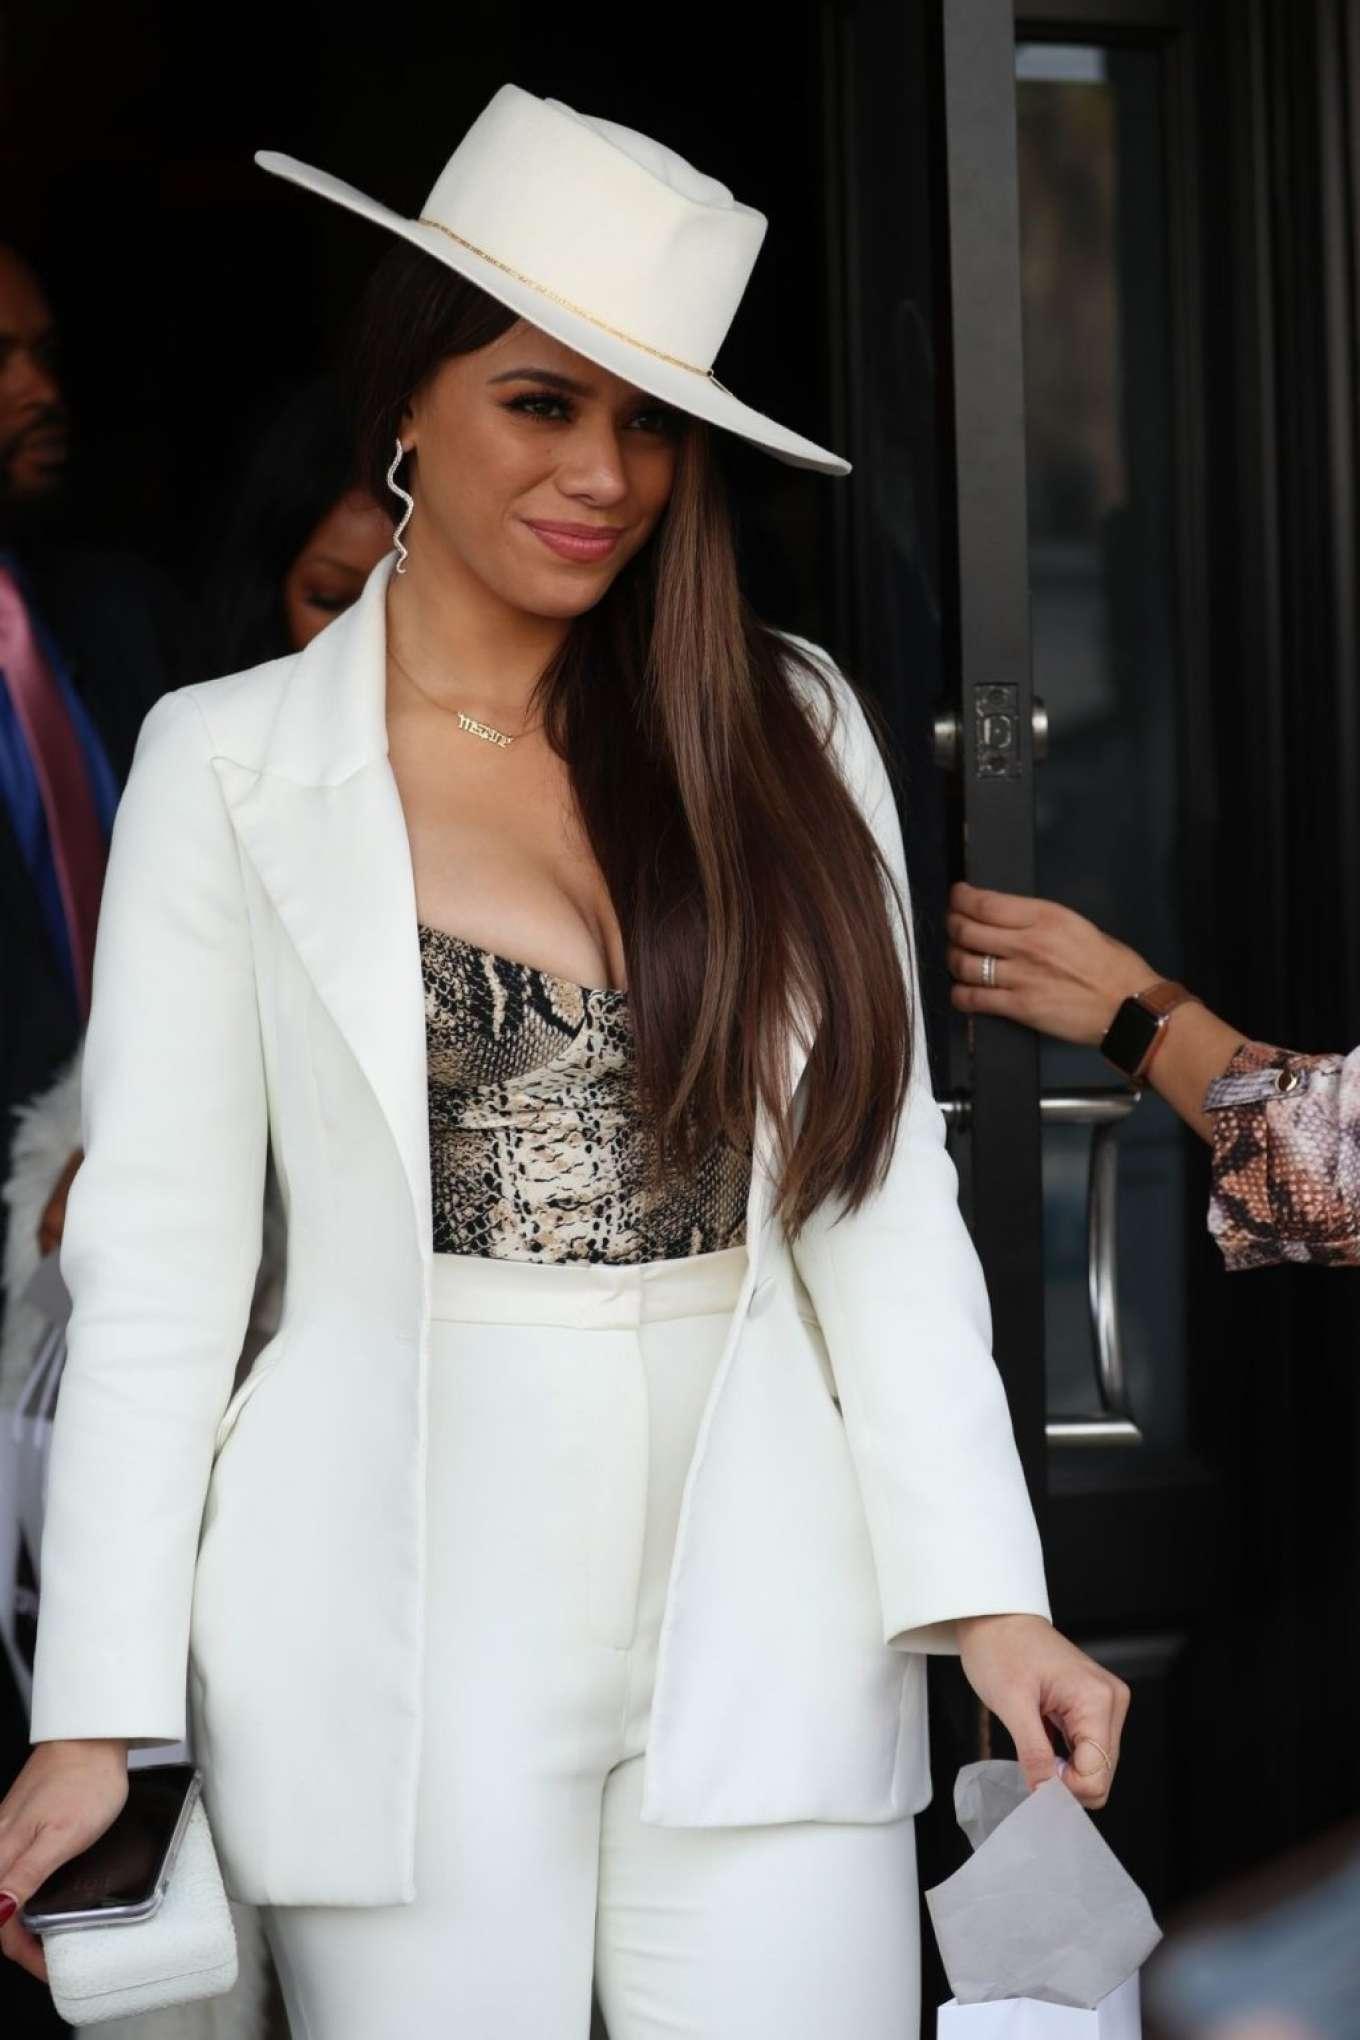 Dinah Jane Departs the Women in Harmony pre-Grammy